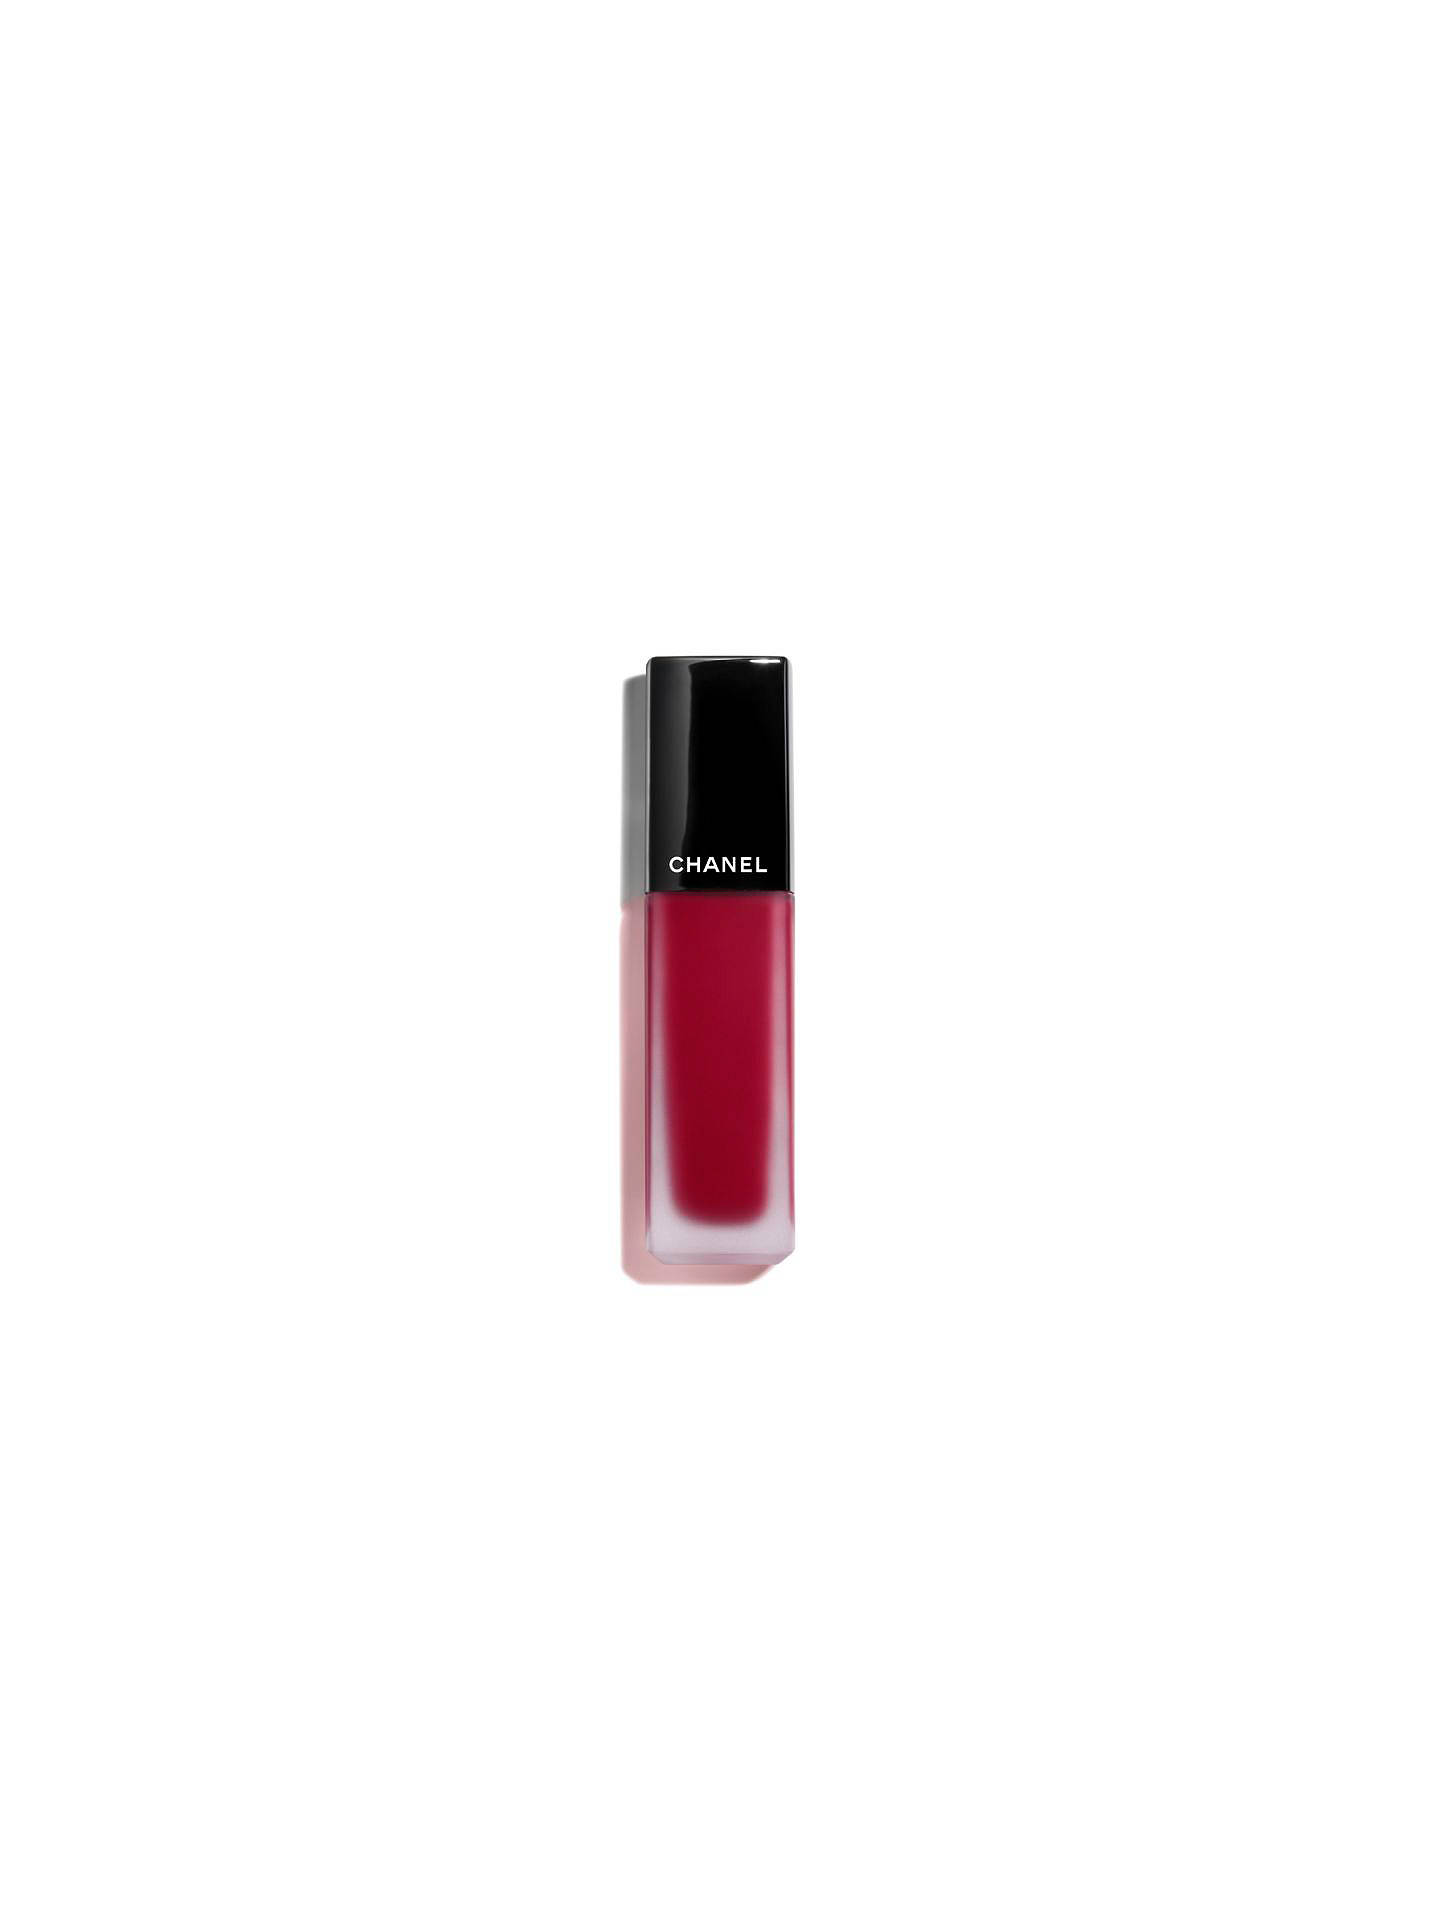 Chanel Rouge Allure Ink Matte Liquid Lip Colour by Chanel